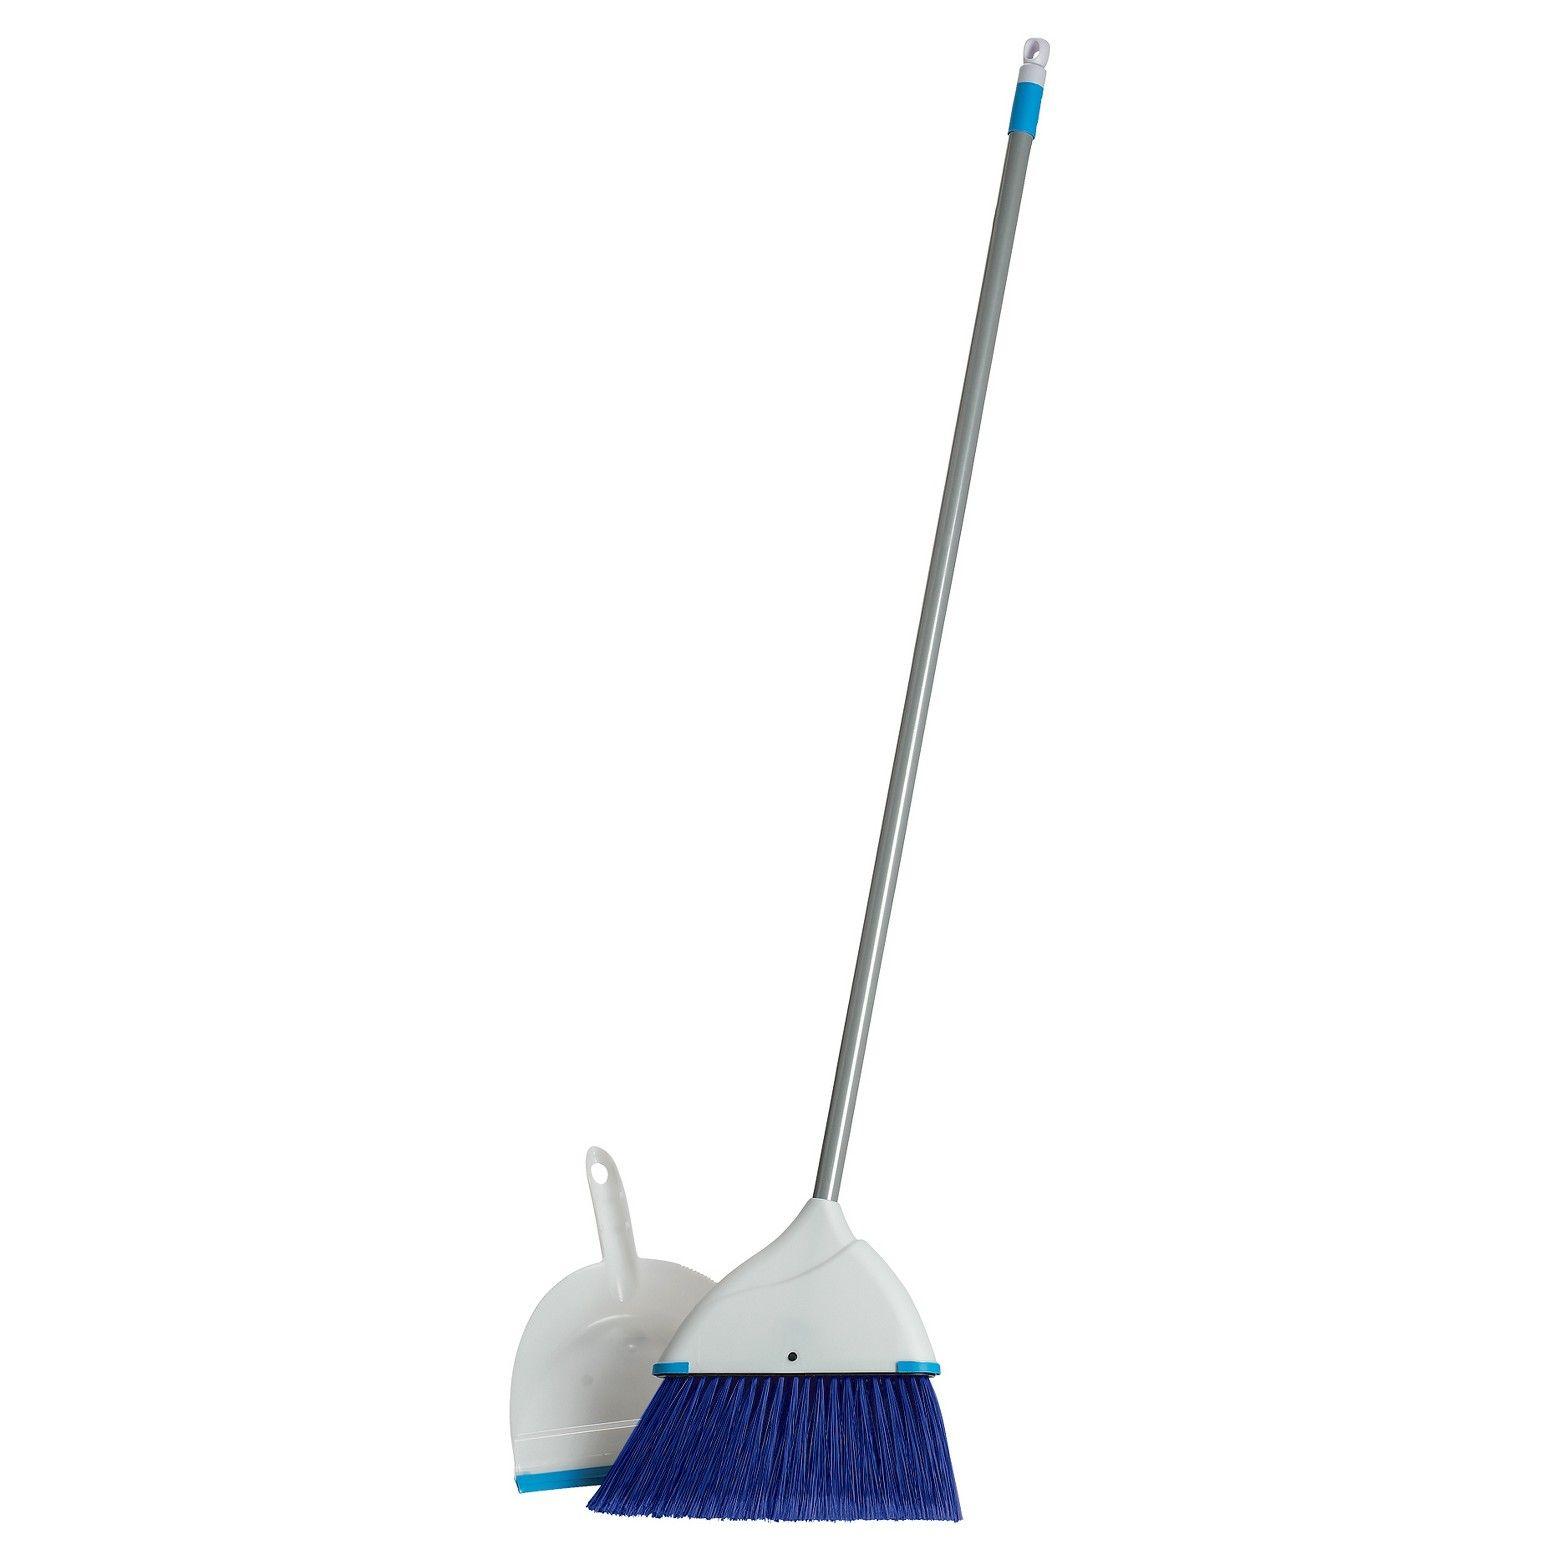 Clorox Angle Broom And Dustpan In 2020 Broom And Dustpan Broom Dust Pan